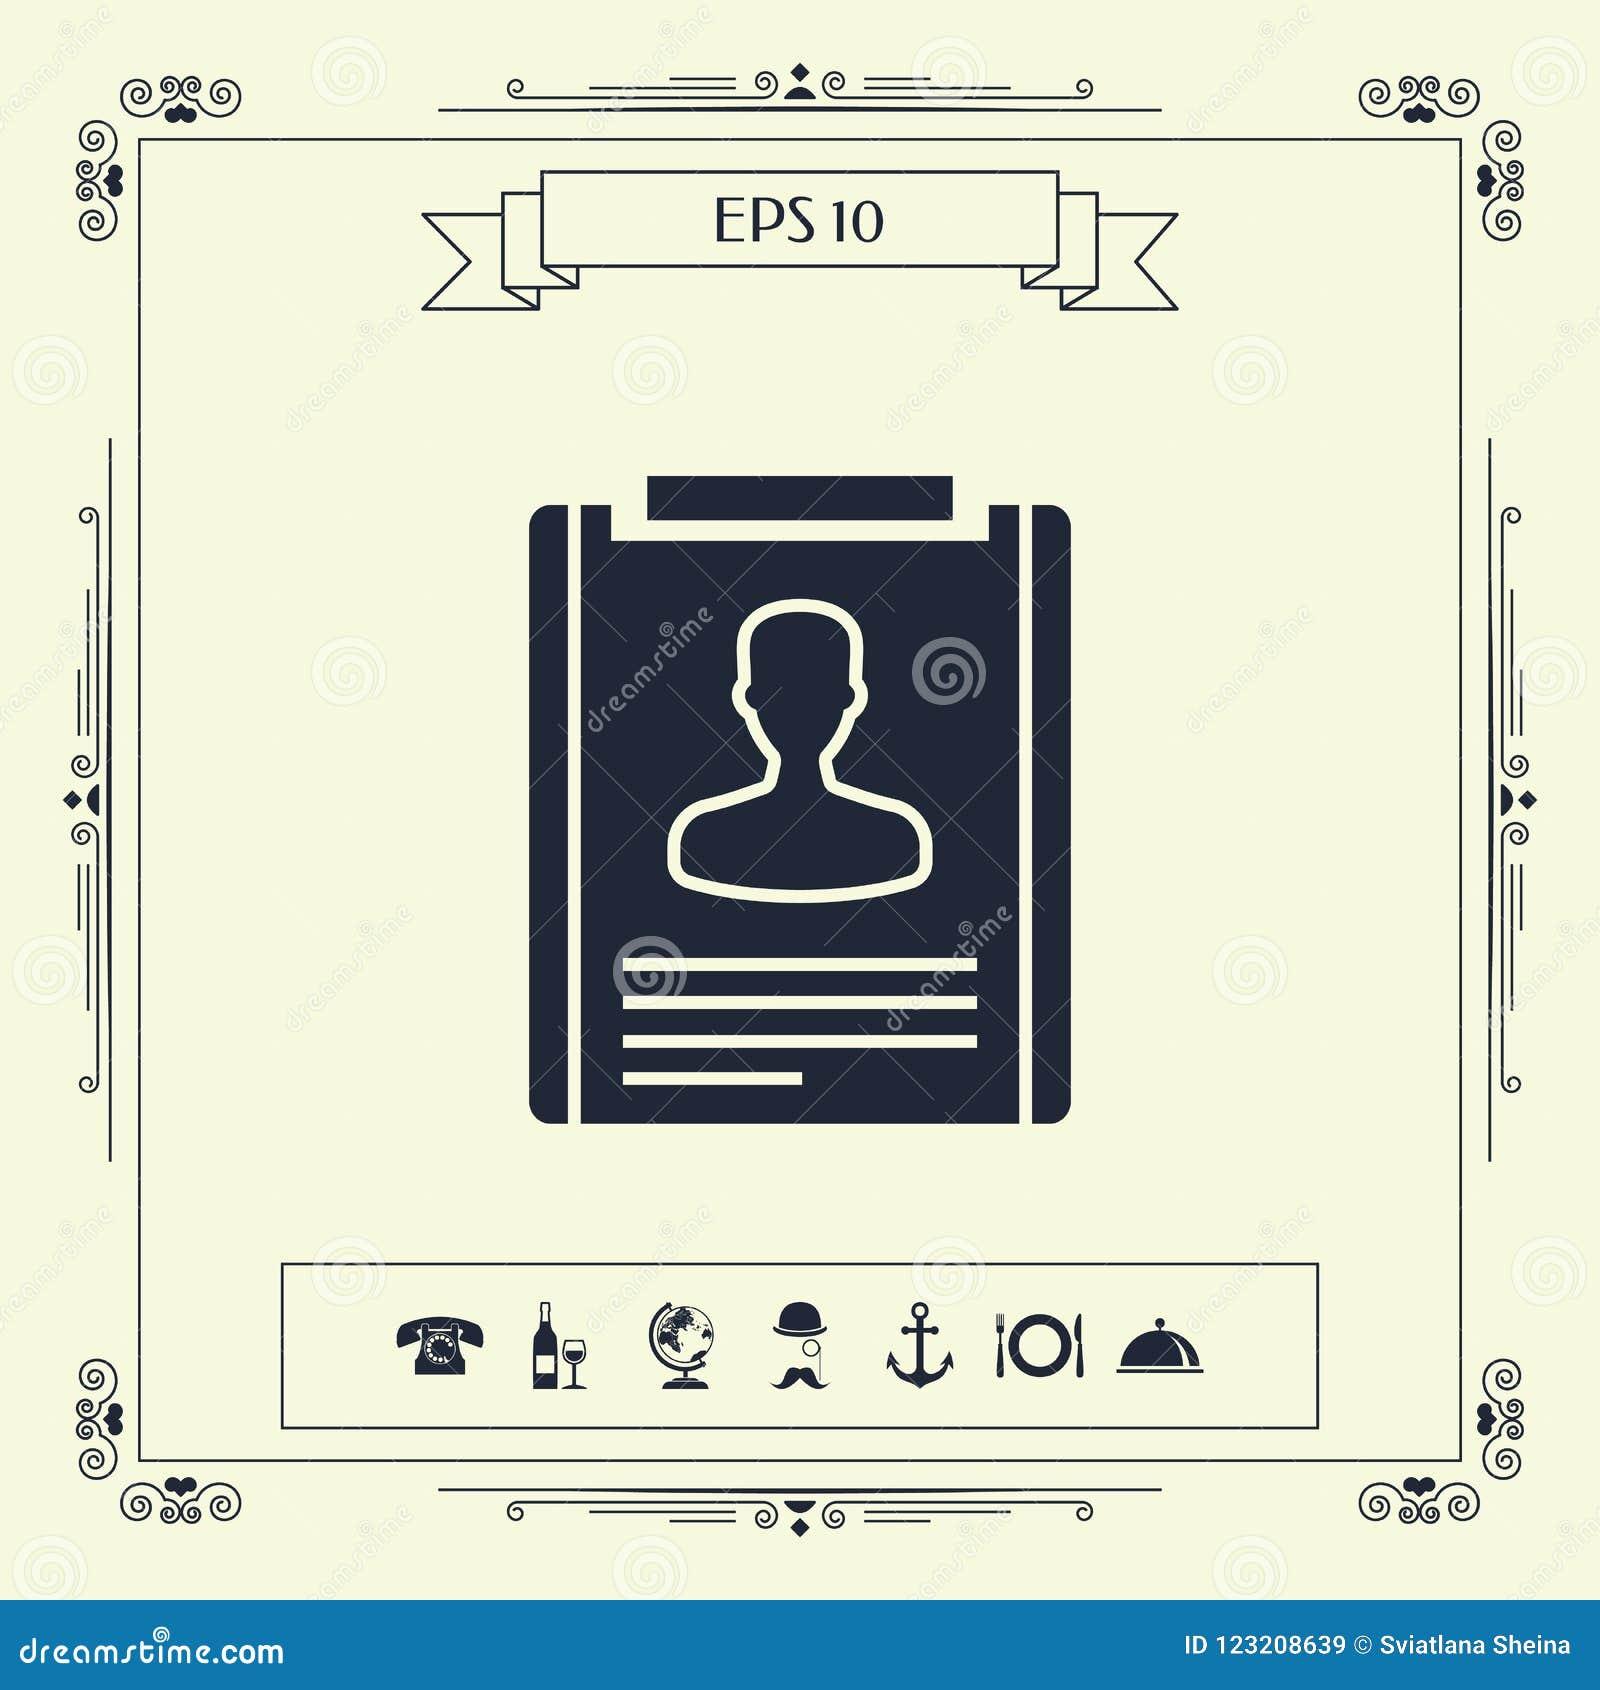 Resume icon symbol stock vector. Illustration of person - 123208639